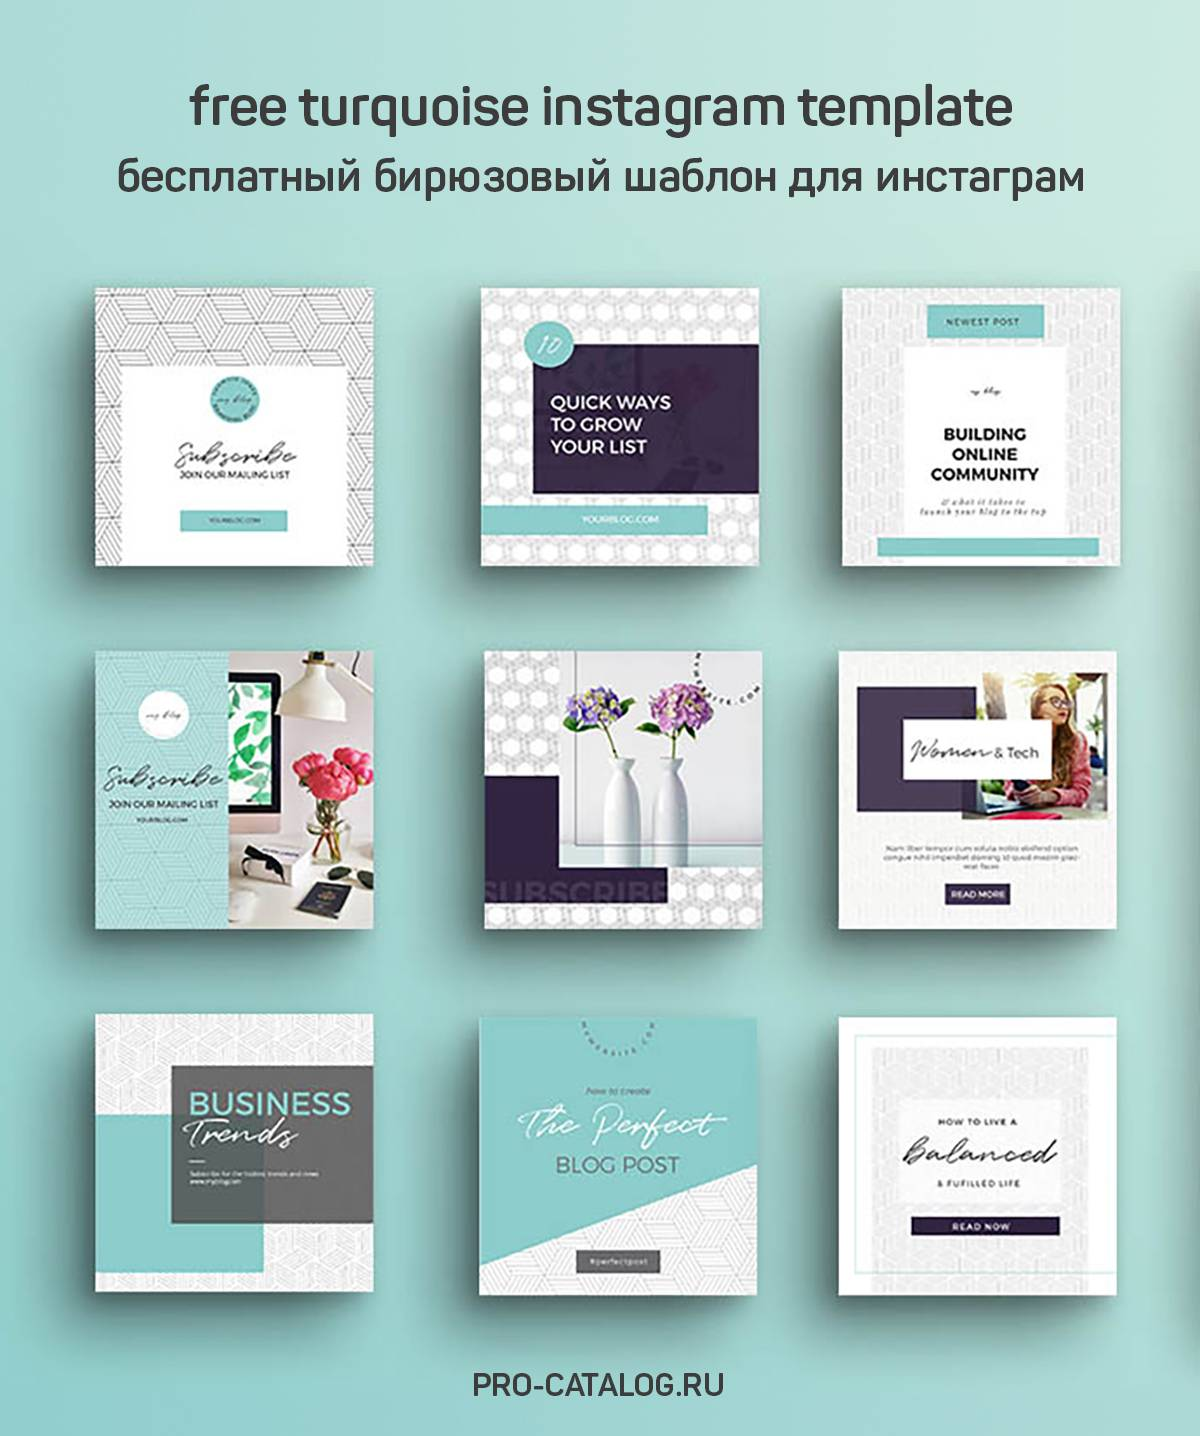 Free turquoise instagram template / Бесплатный бирюзовый шаблон для инстограм